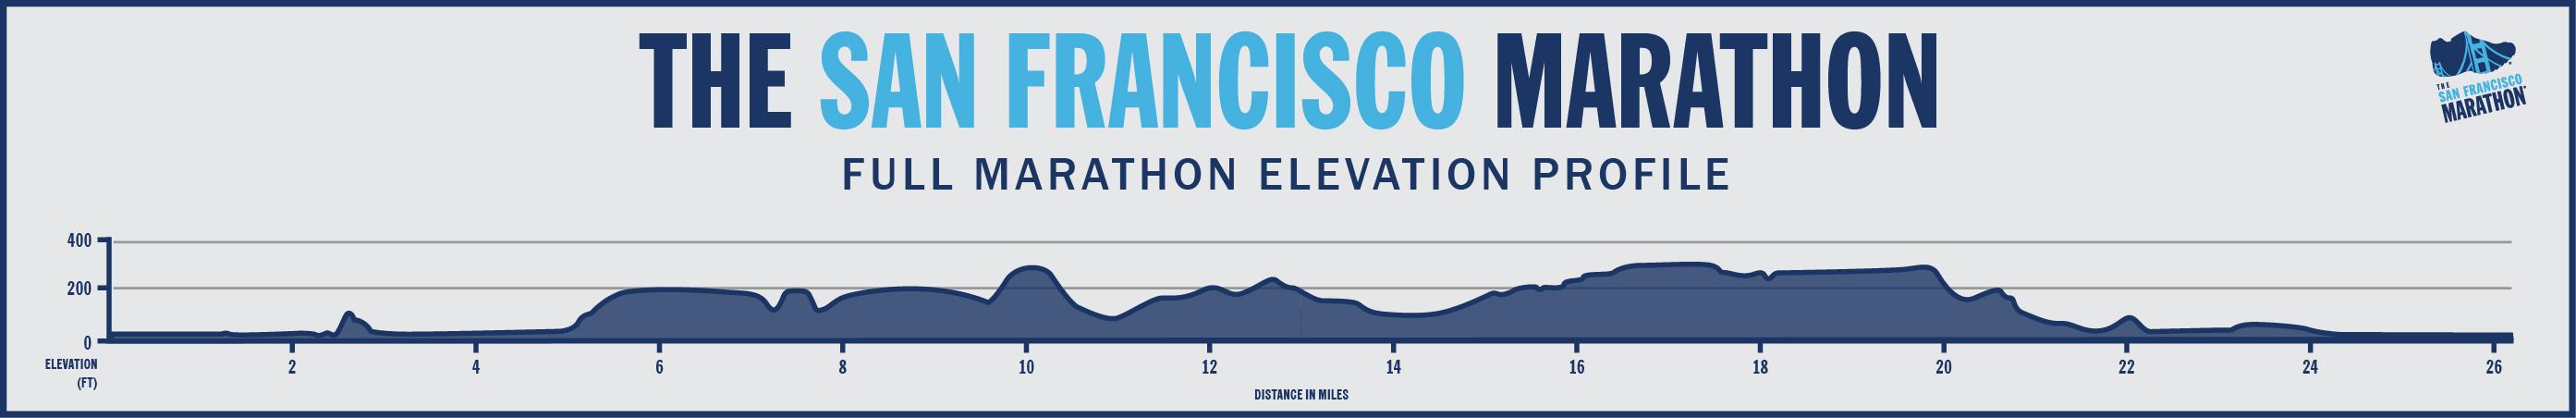 sf marathon elevation map Full Marathon Elevation Profile The San Francisco Marathon